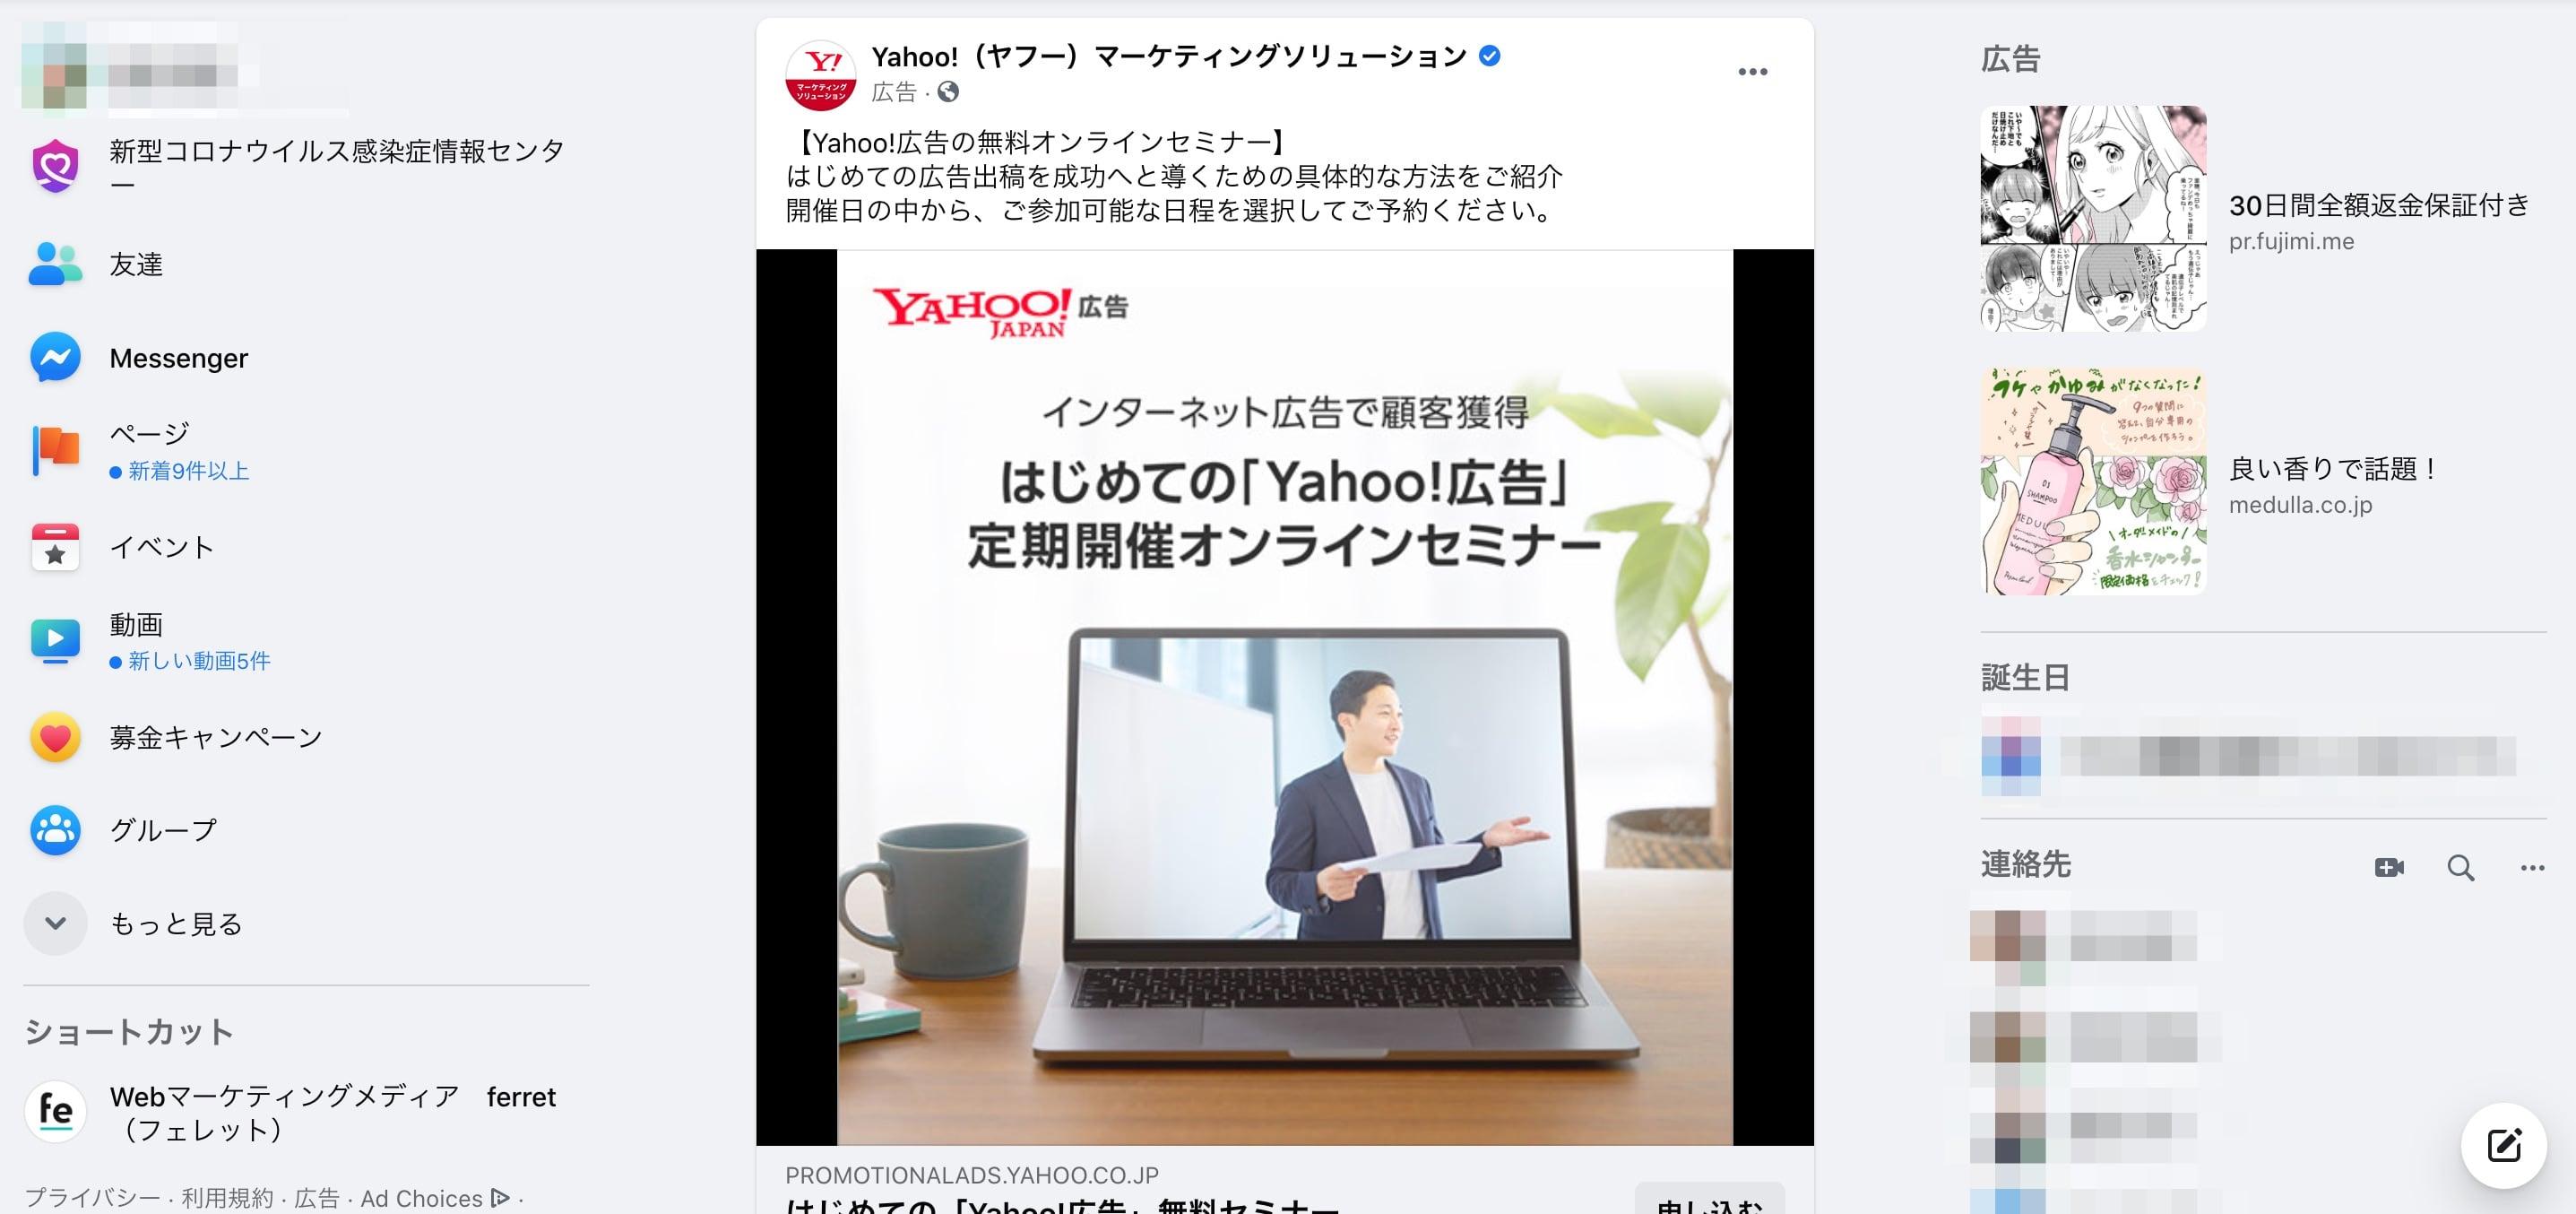 Facebook(フェイスブック)広告のキャプチャ